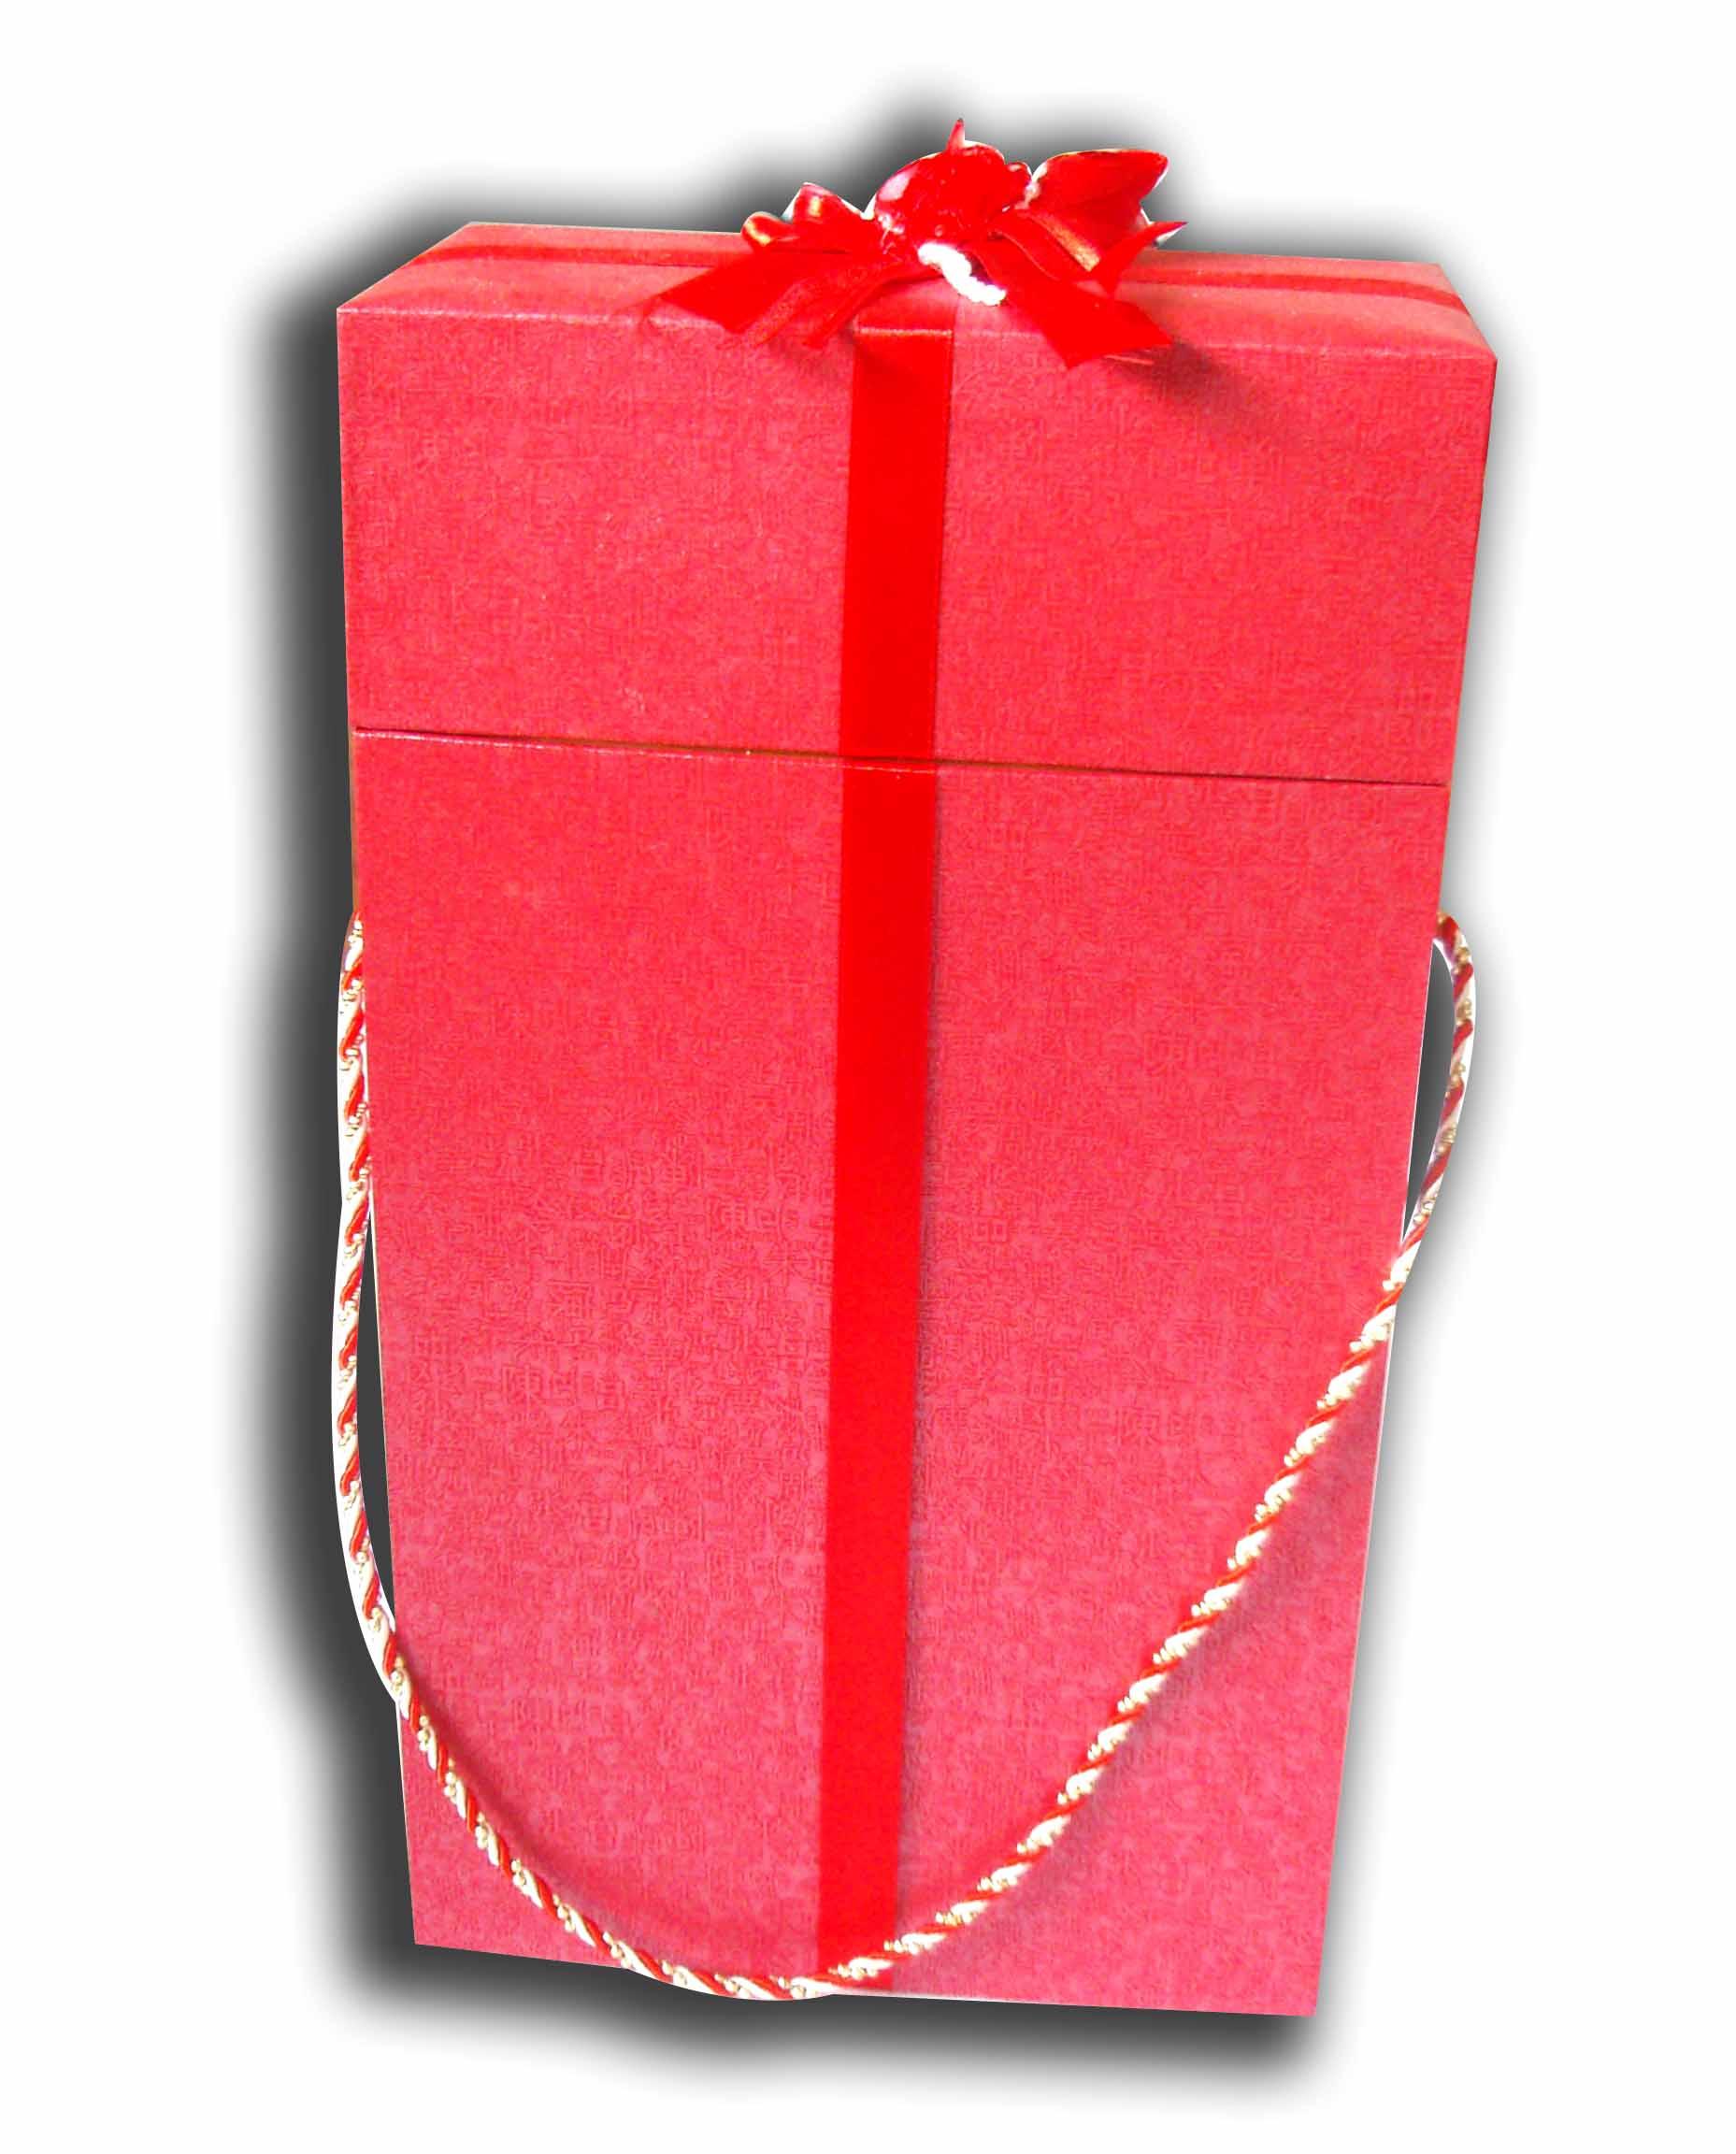 Champagne glass gift box